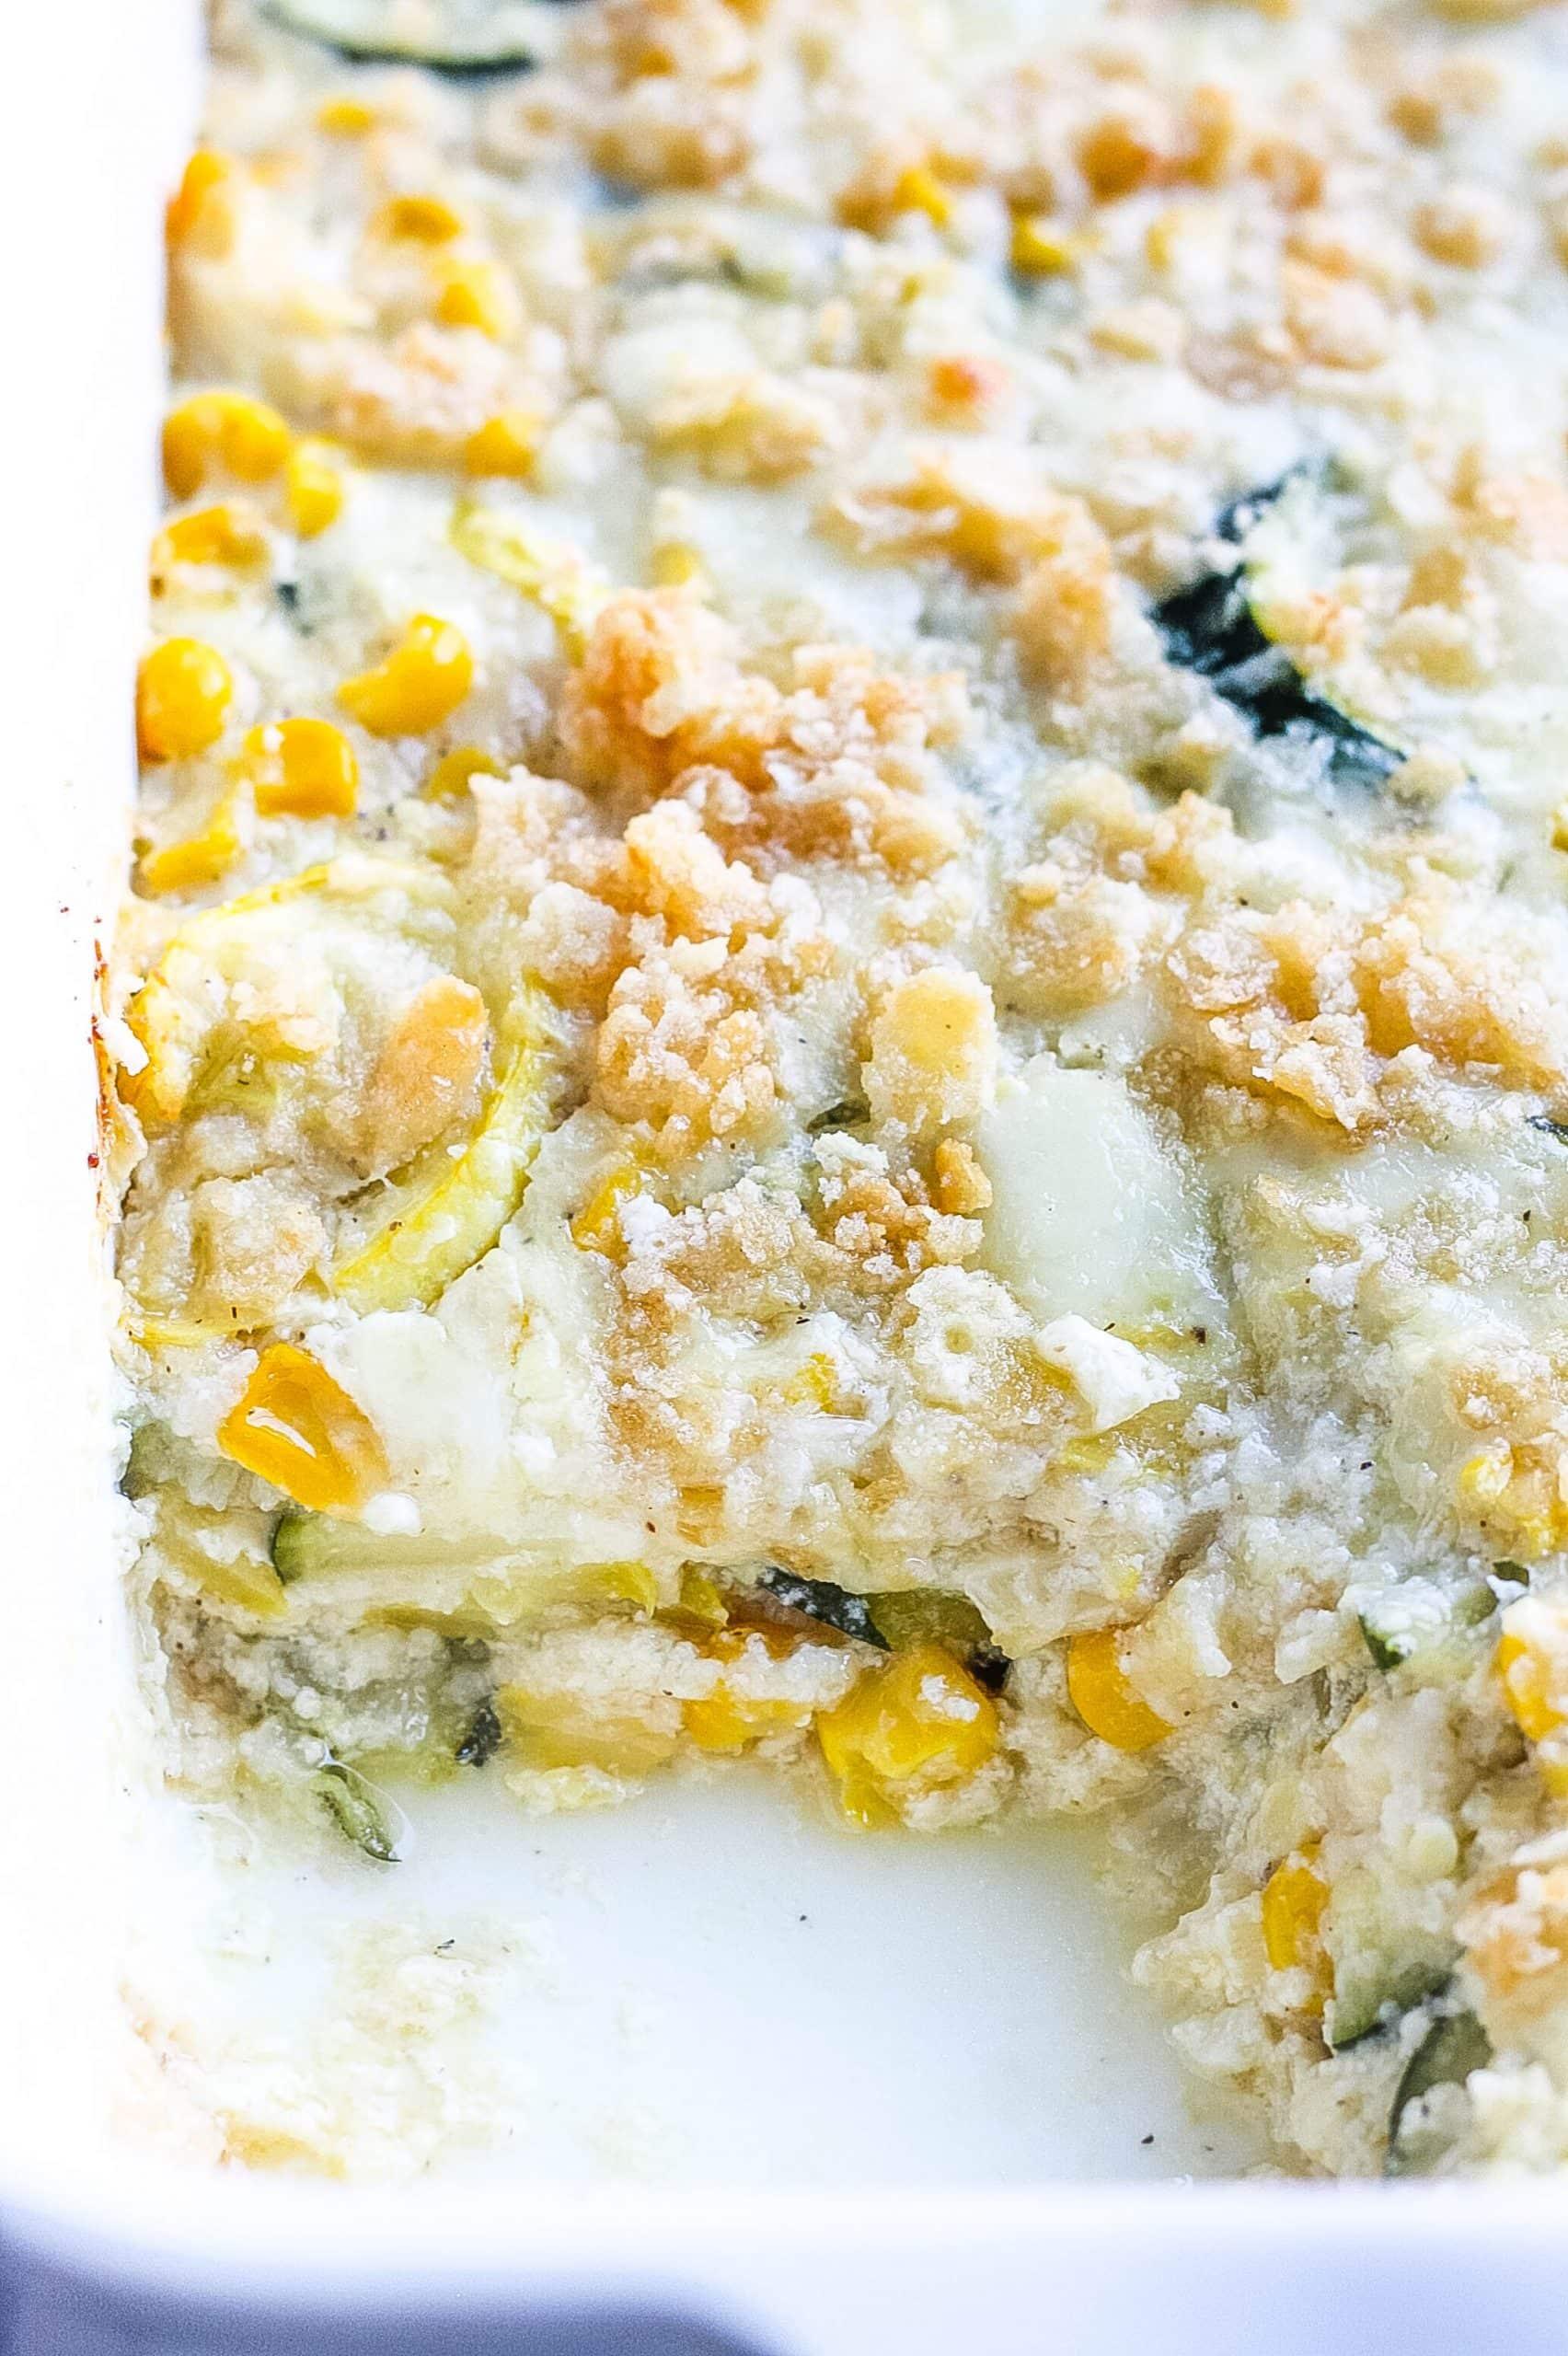 Cheesy Zucchini, Squash and Corn Bake